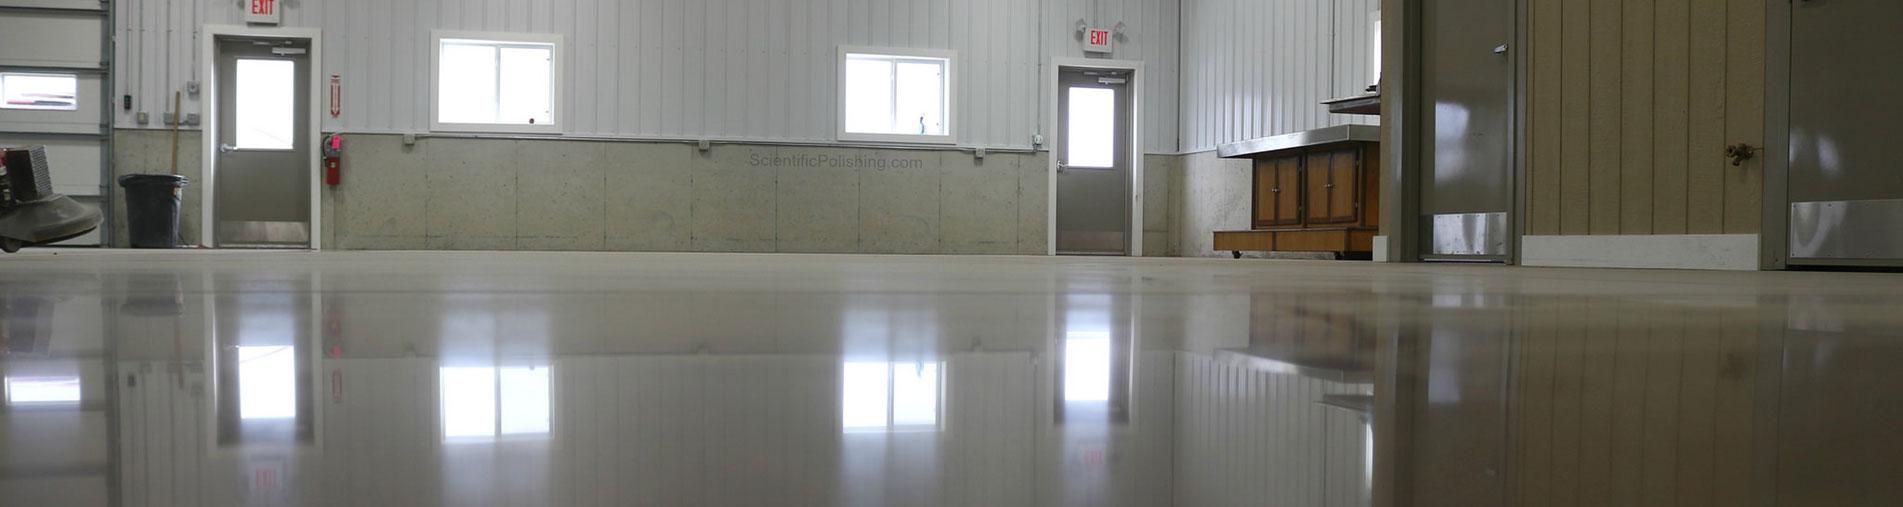 Terrazzo Floor Polishing Miami Dade Terrazzo Floor